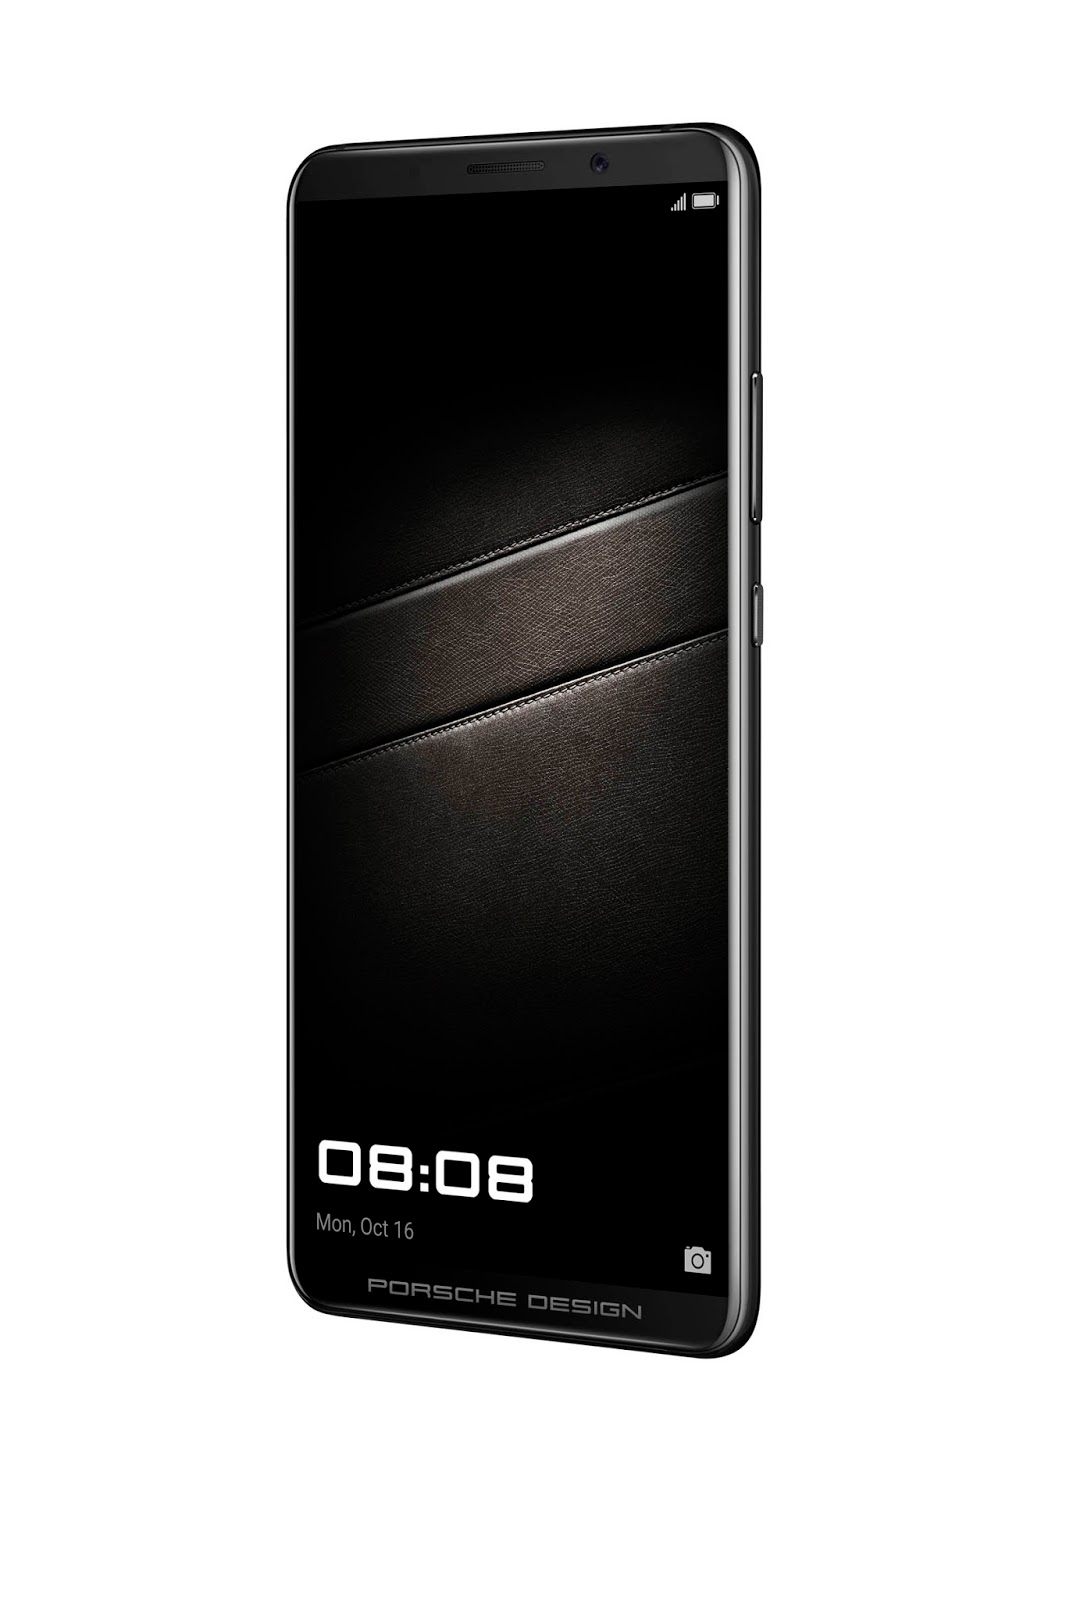 Huawei_Mate_10_Porsche_Design_03